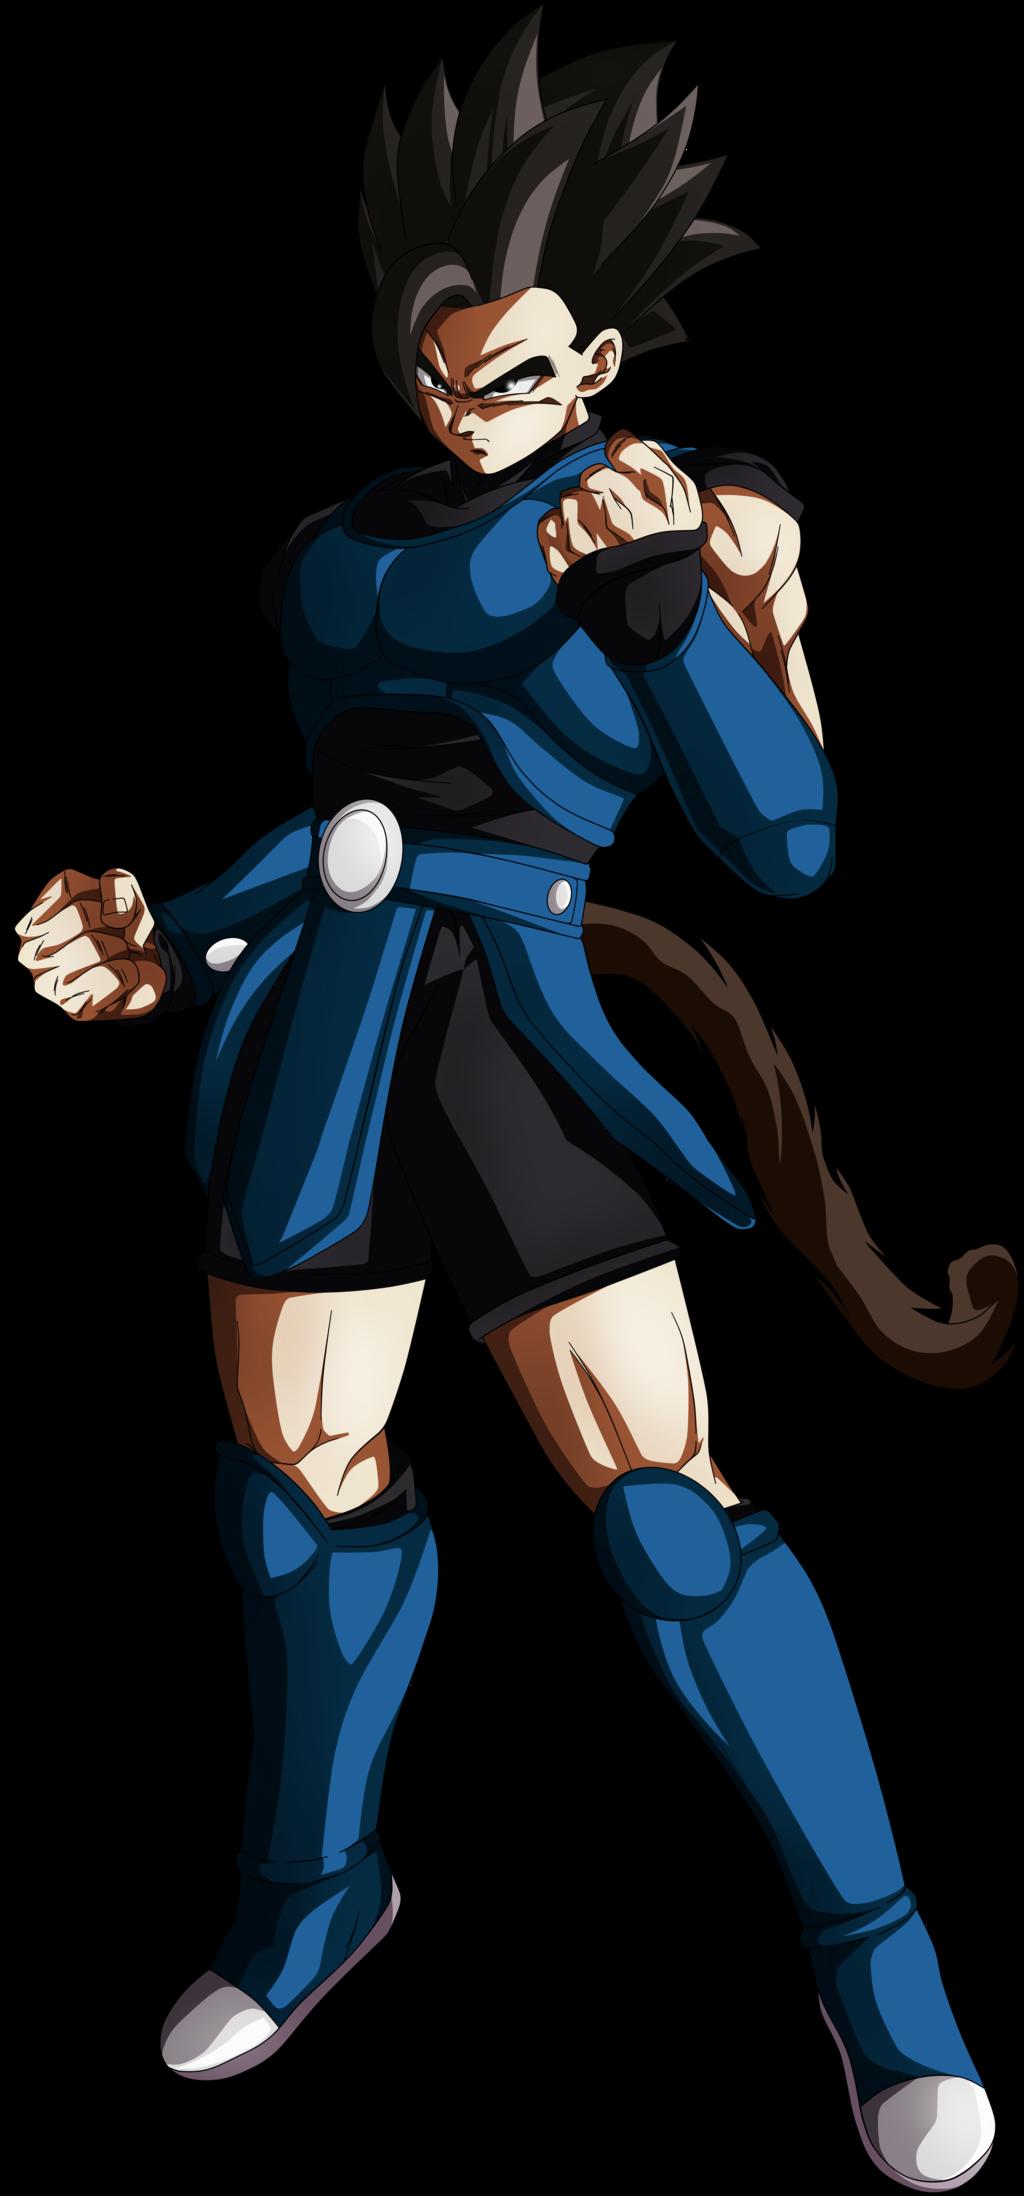 A New History. Sharotto by Koku78 Anime Artworks